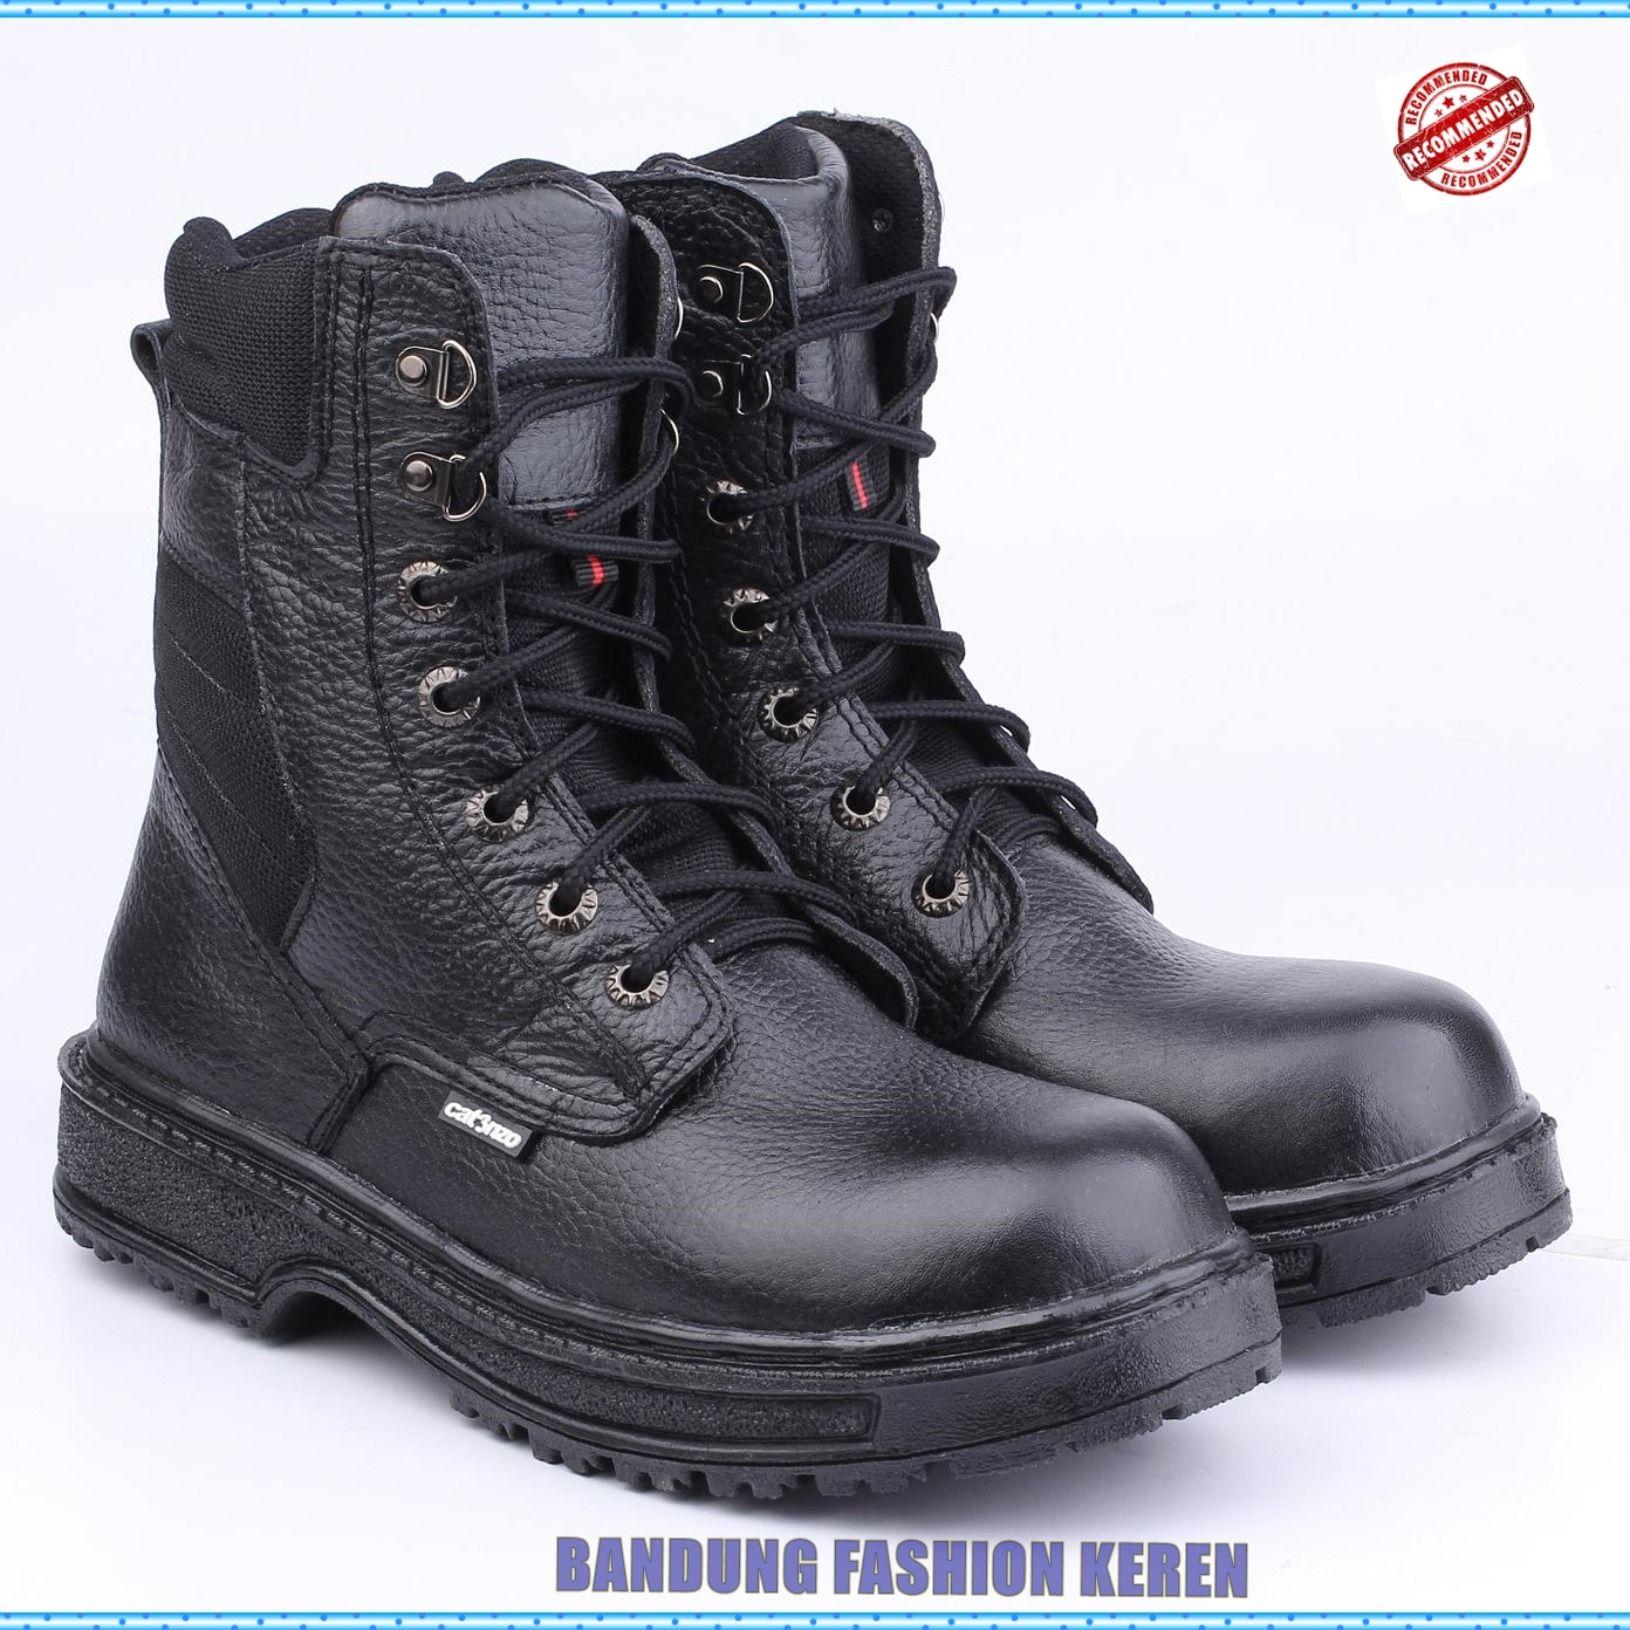 Sepatu Safety Pria Li 056 Produk Fashion Handmade Terbaik 100